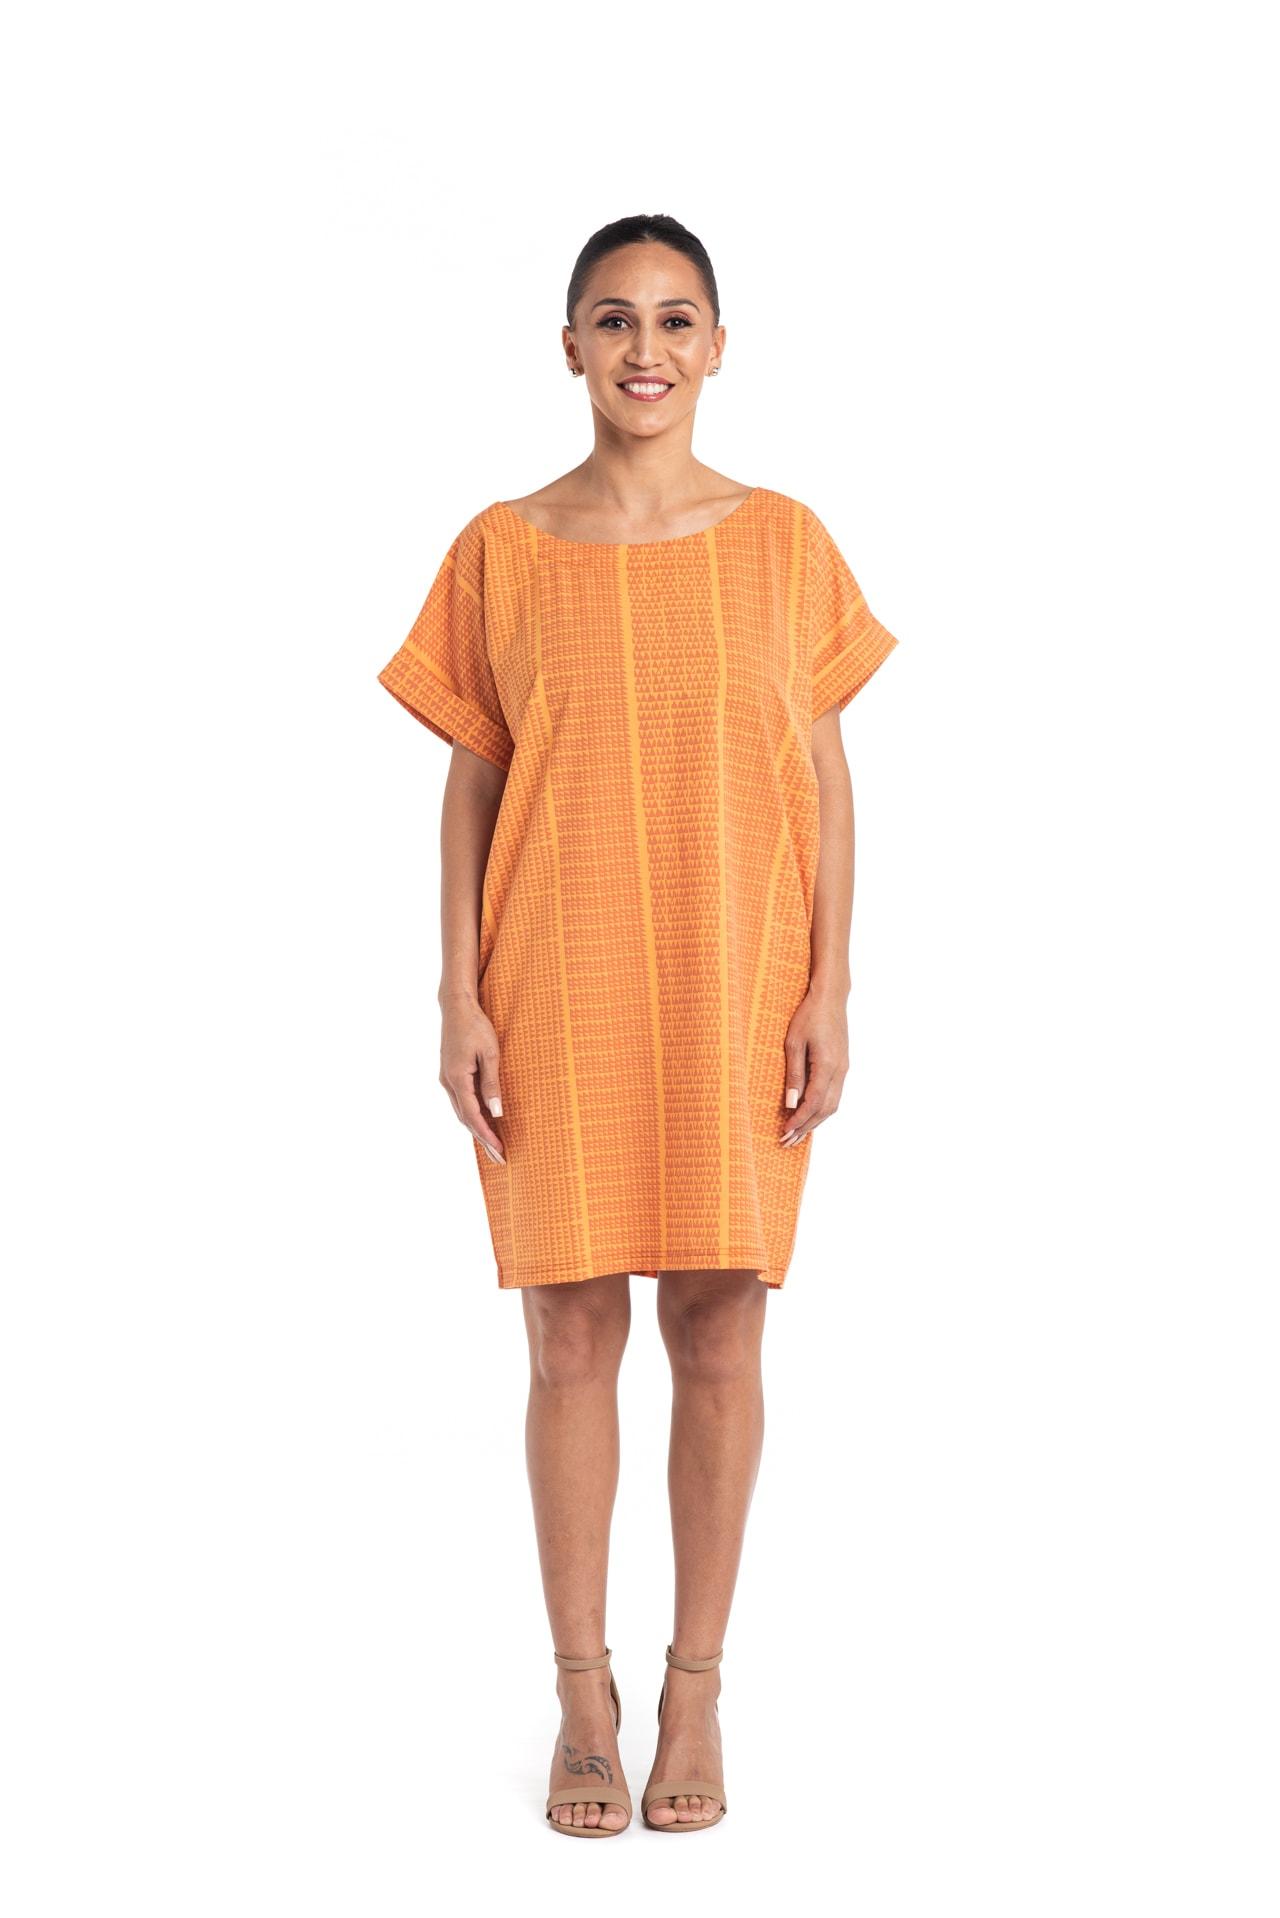 Model wearing Puaniu Shift Dress in Orange - Front View